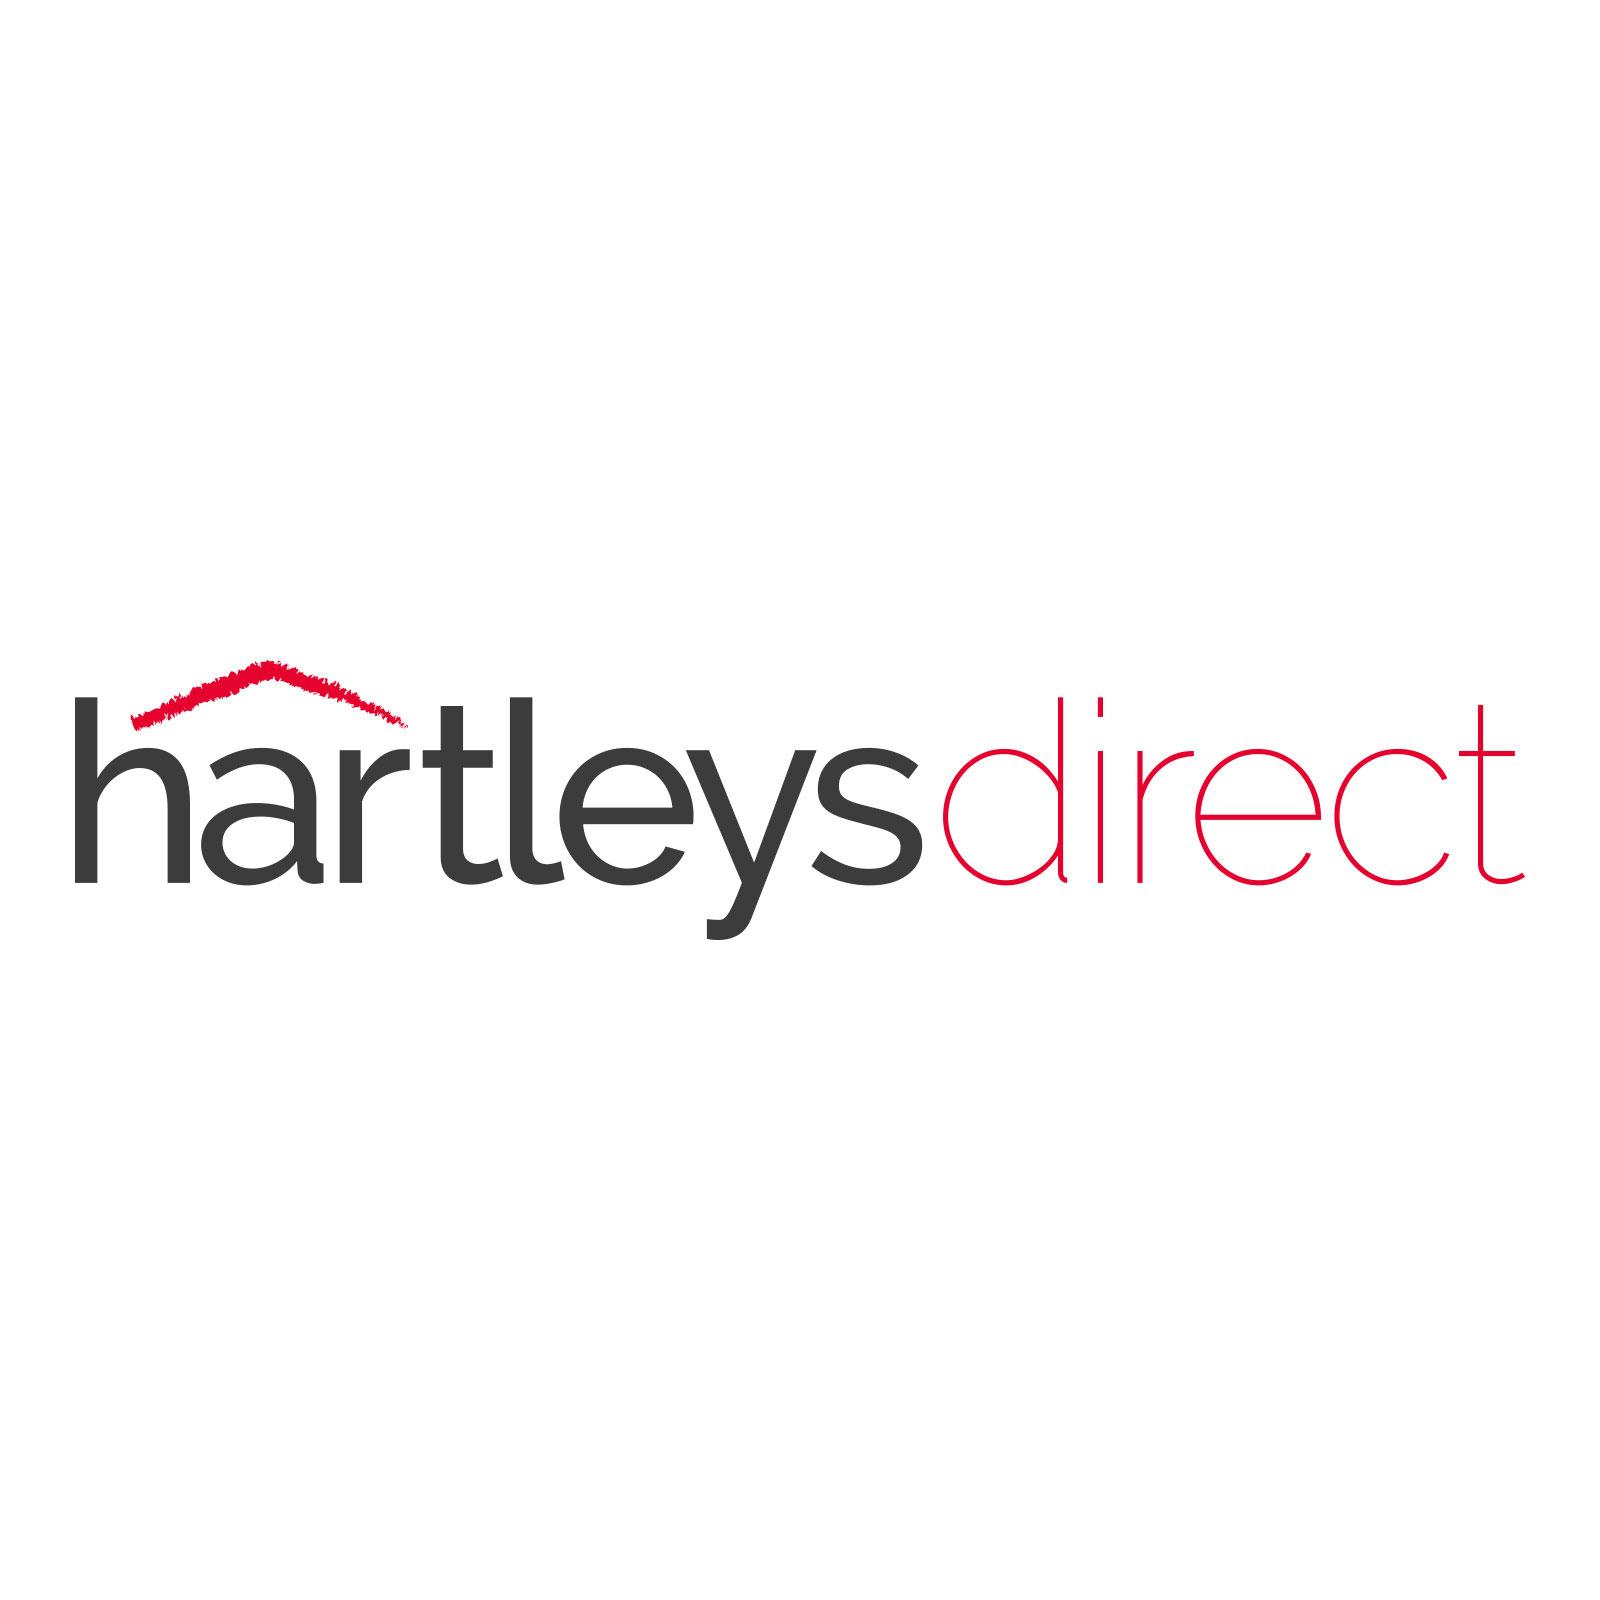 Hartleys-27-inch-Black-Heavy-Duty-Plastic-Office-Chair-Base-on-White-Background.jpg